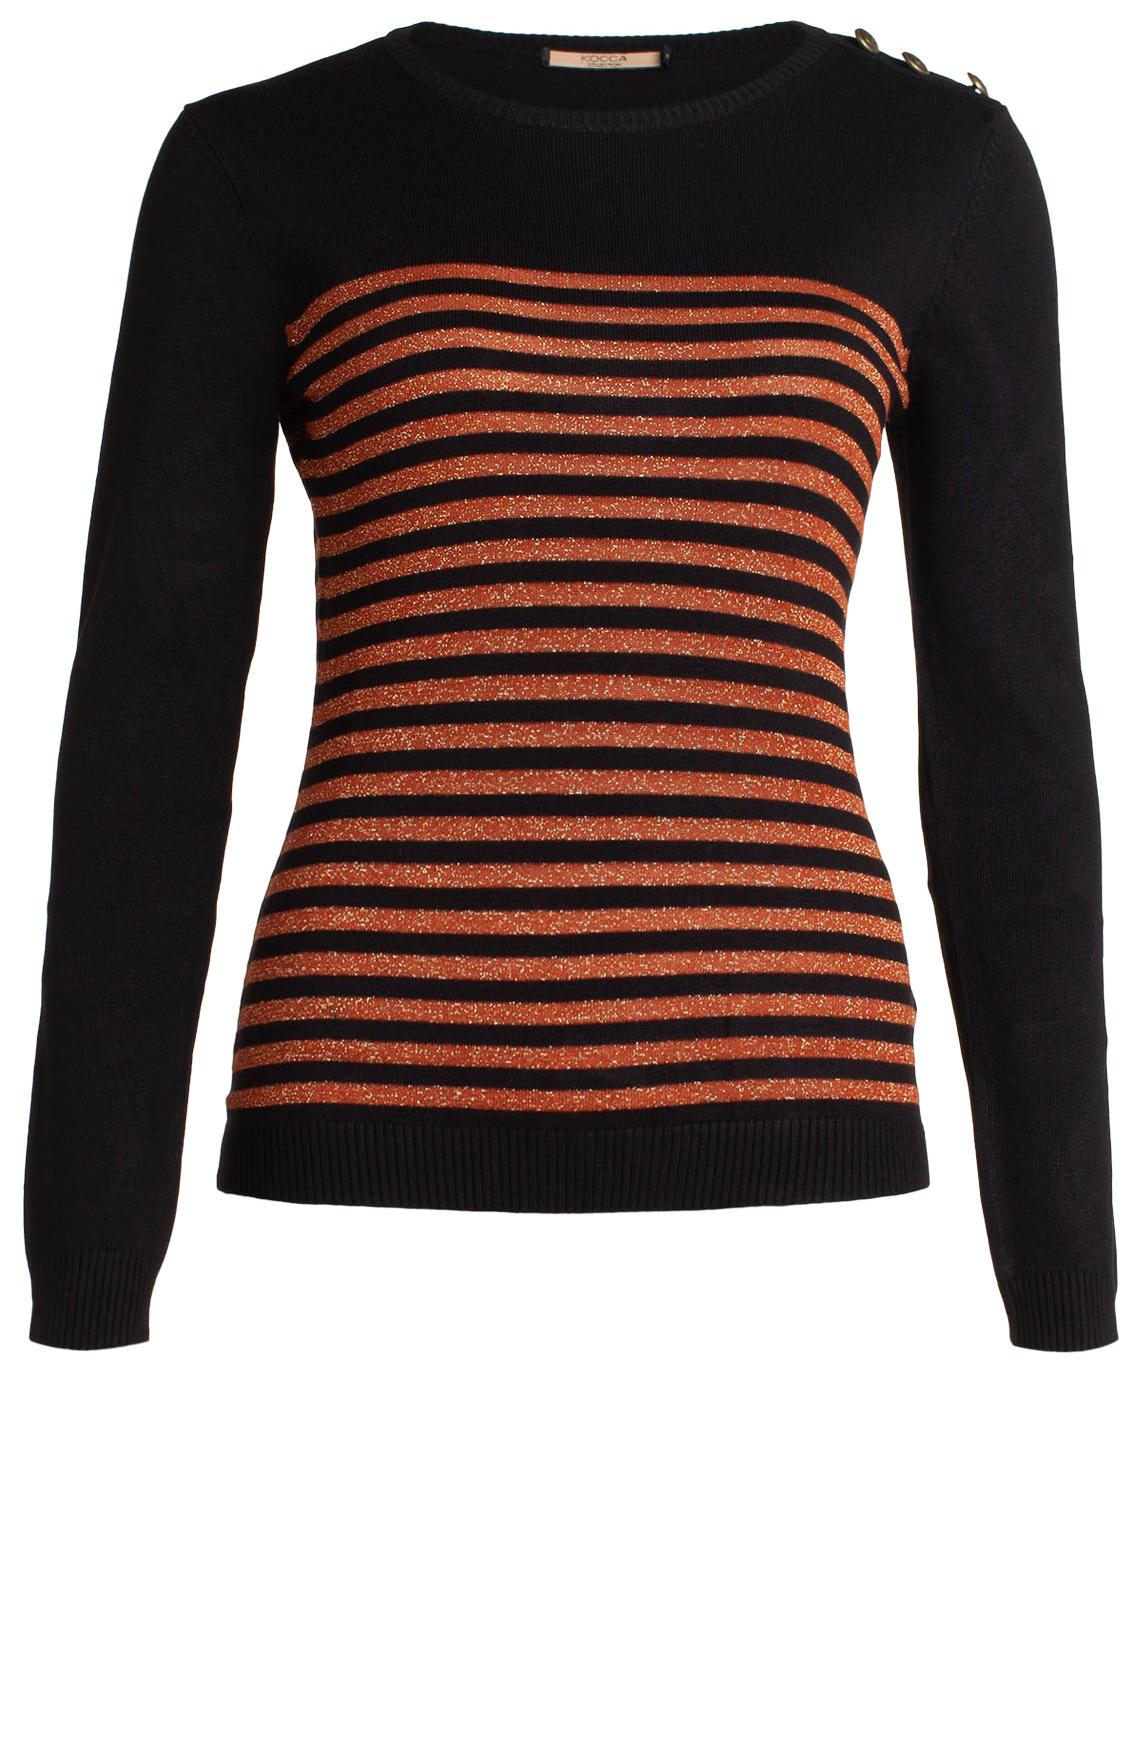 Kocca Dames Luk pullover met lurex strepen zwart